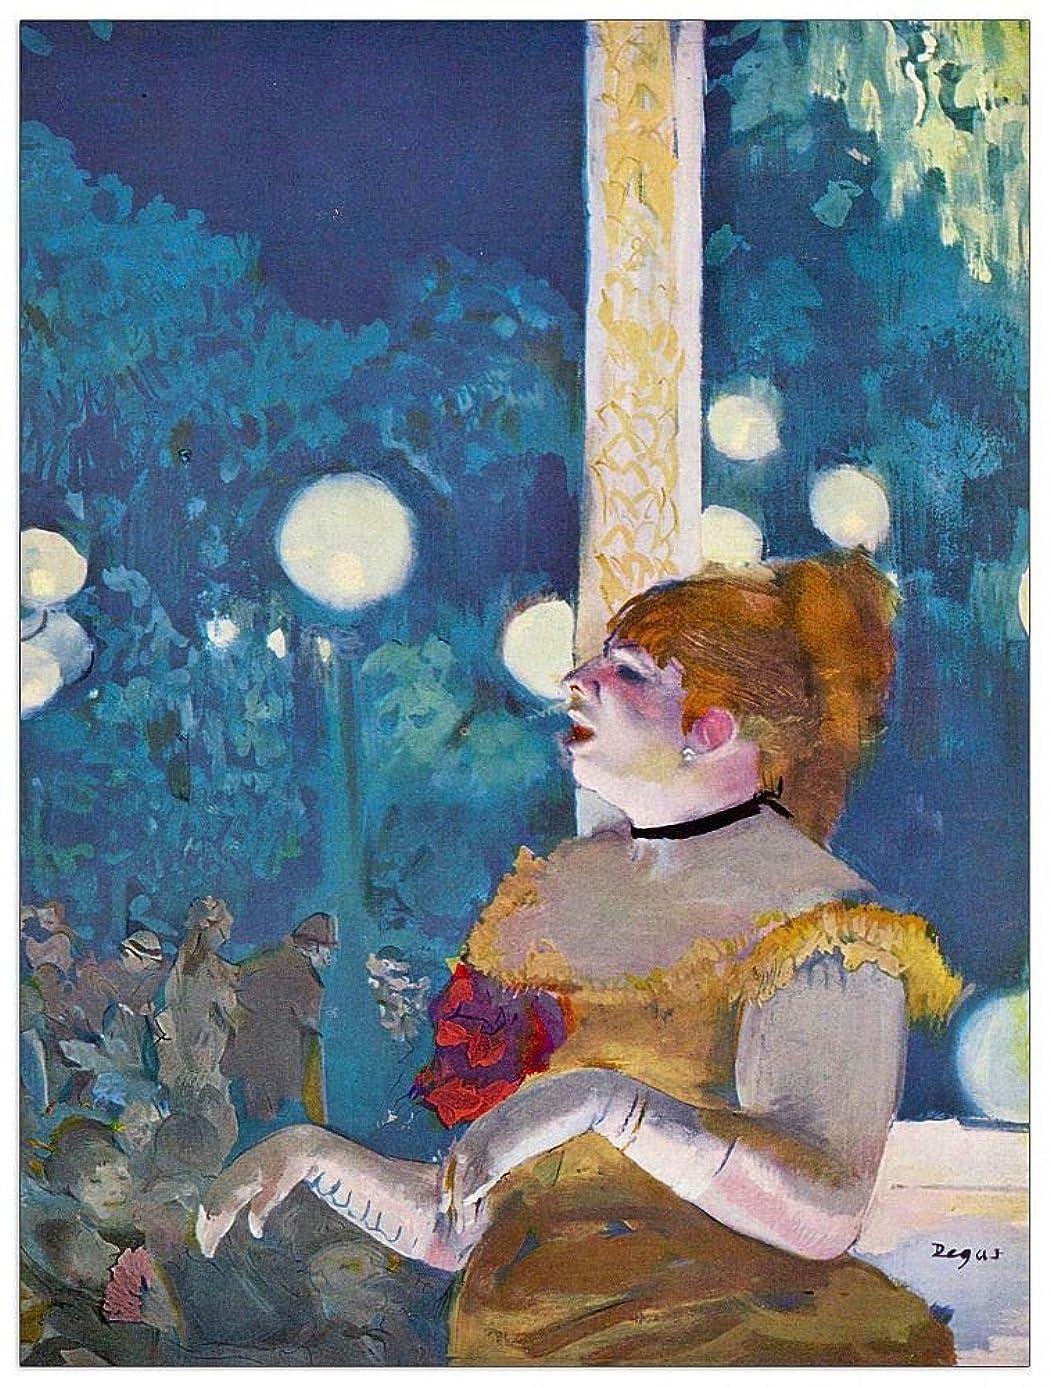 ArtPlaza TW93072 Degas Edgar - in Concert Cafe Decorative Panel 27.5x35.5 Inch Multicolored